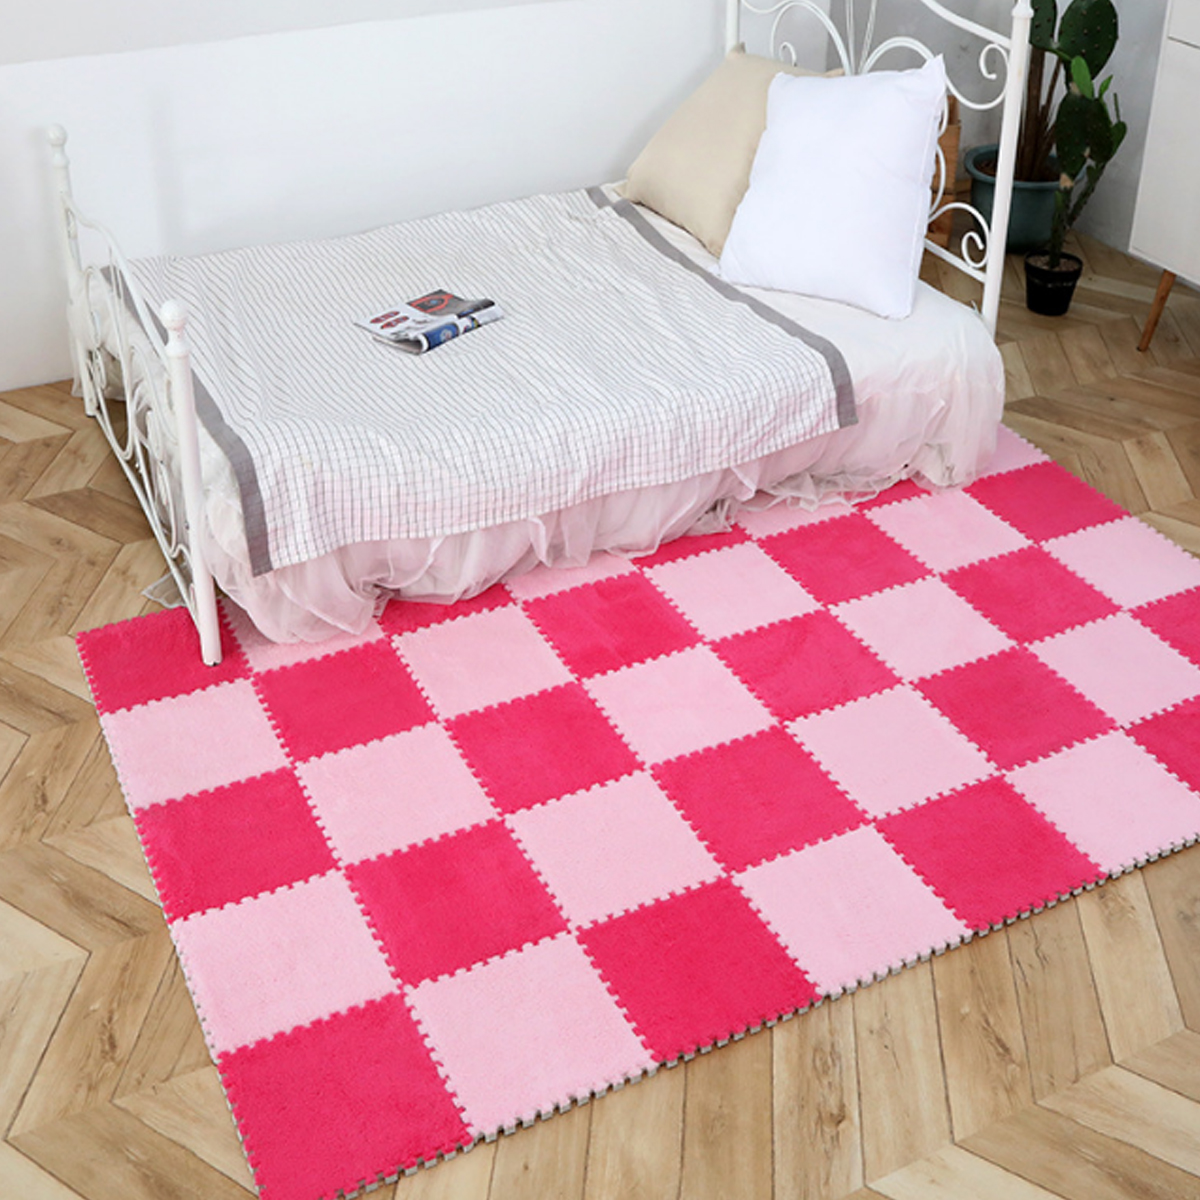 5Pcs/Set DIY Puzzle Magic Patchwork Jigsaw Splice Heads Living Room Bedroom Children Kids Soft Carpet Floor Climbing Baby Mat